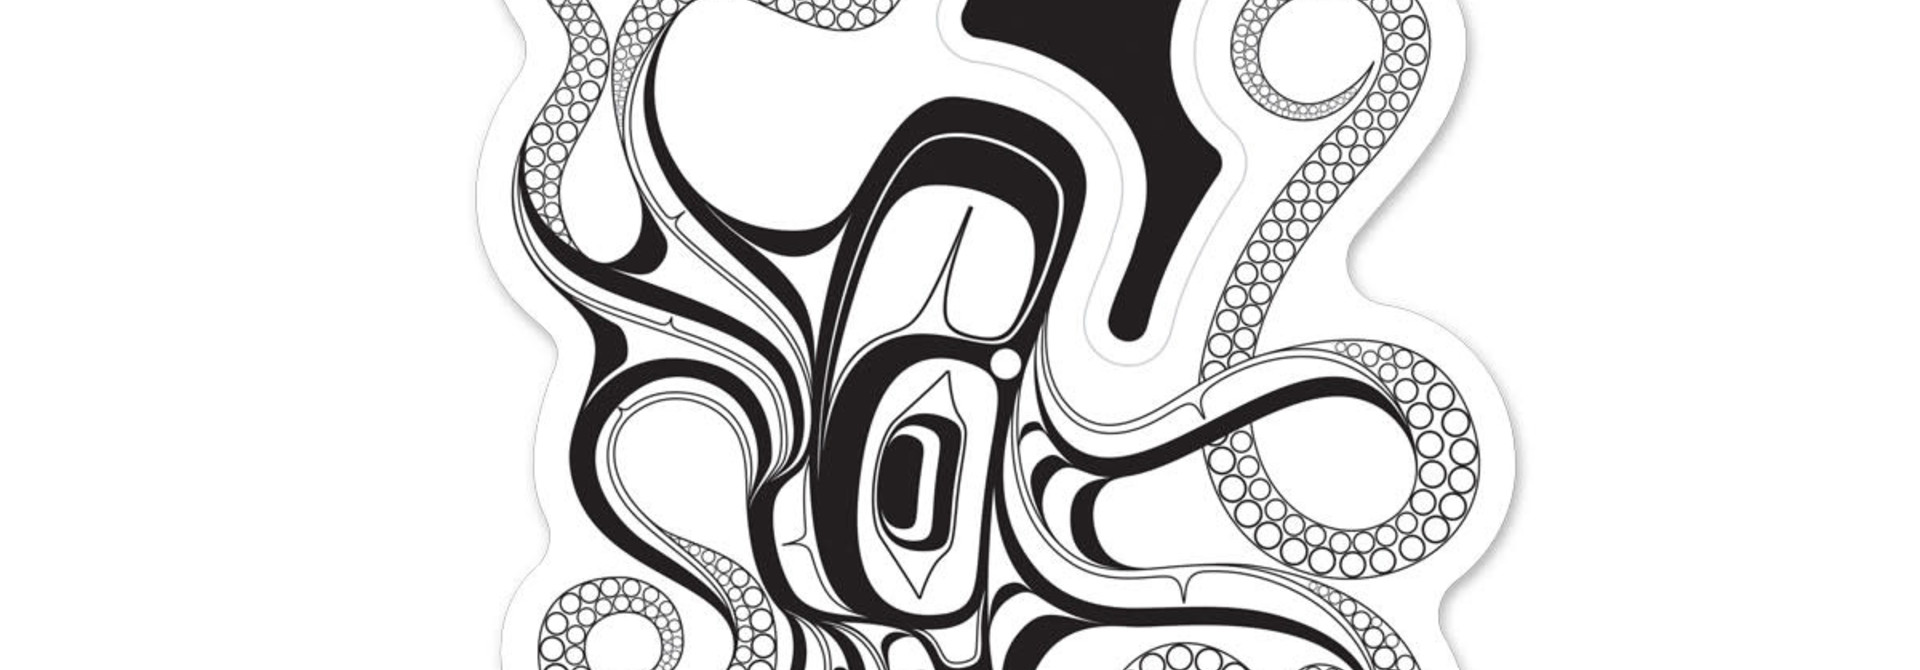 Premium Decal - Octopus (Nuu) by Ernest Swanson